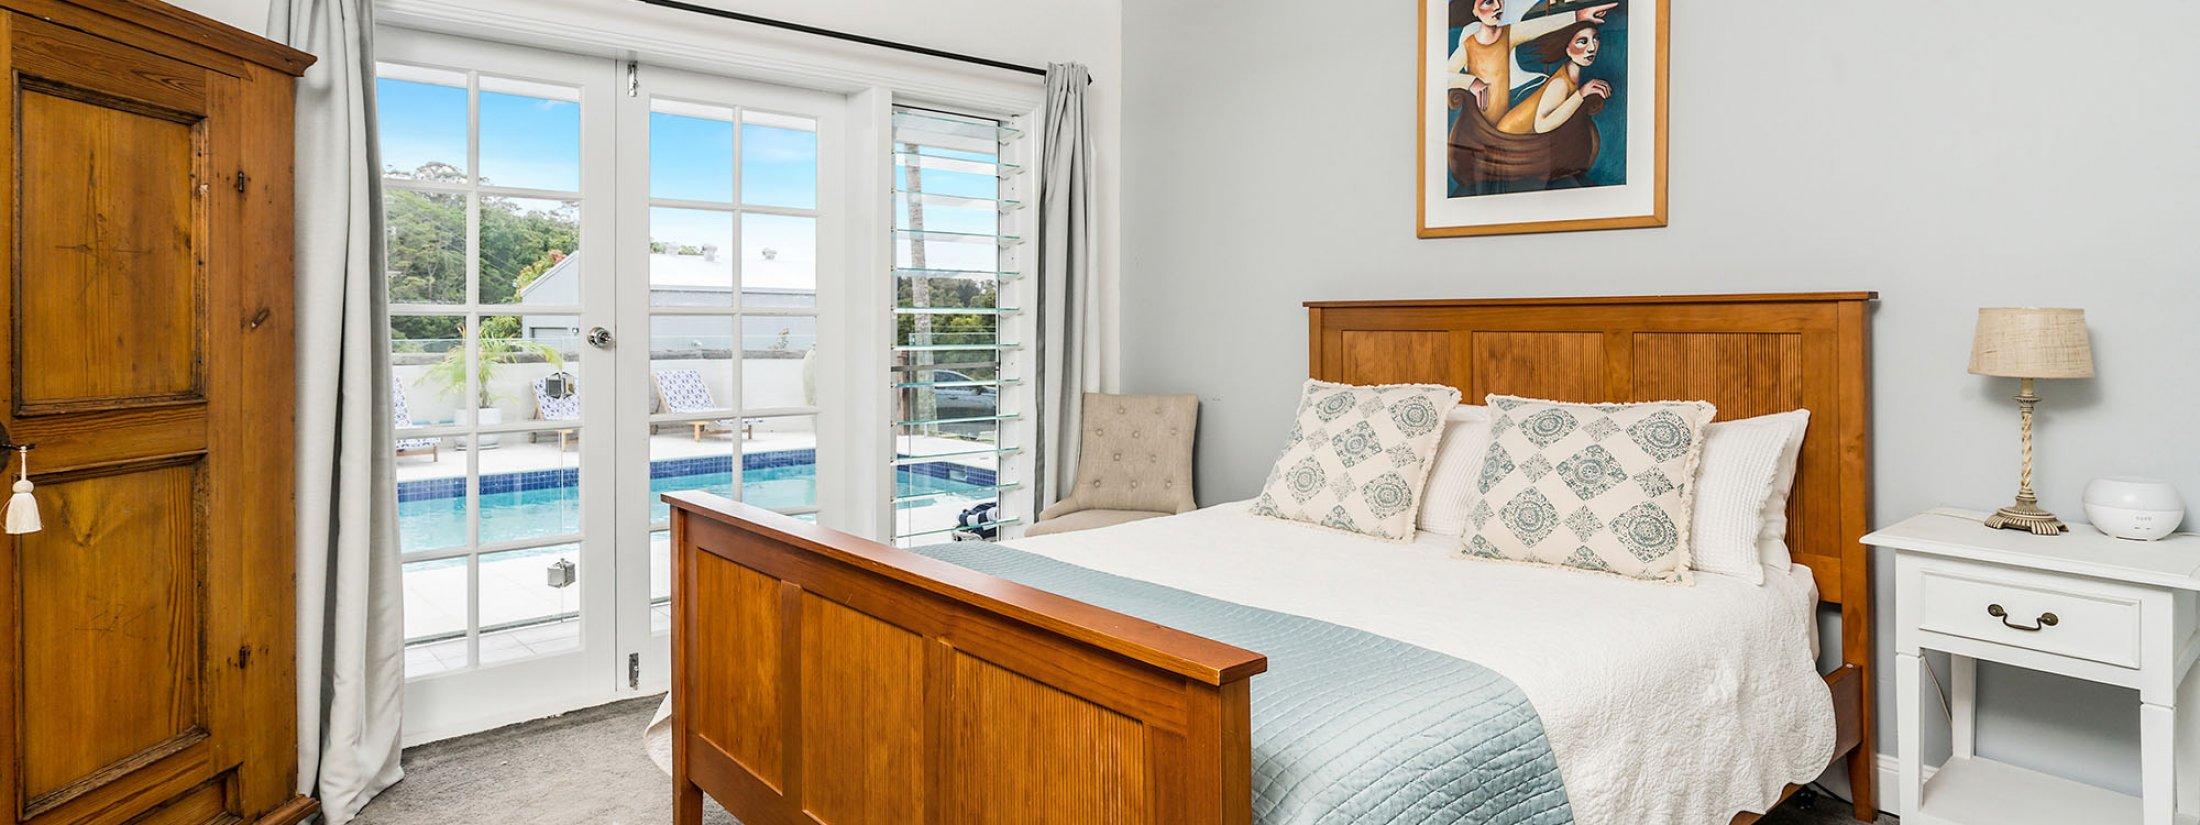 Byron Hills Hinterland Retreat - Byron Bay - Bedroom 2